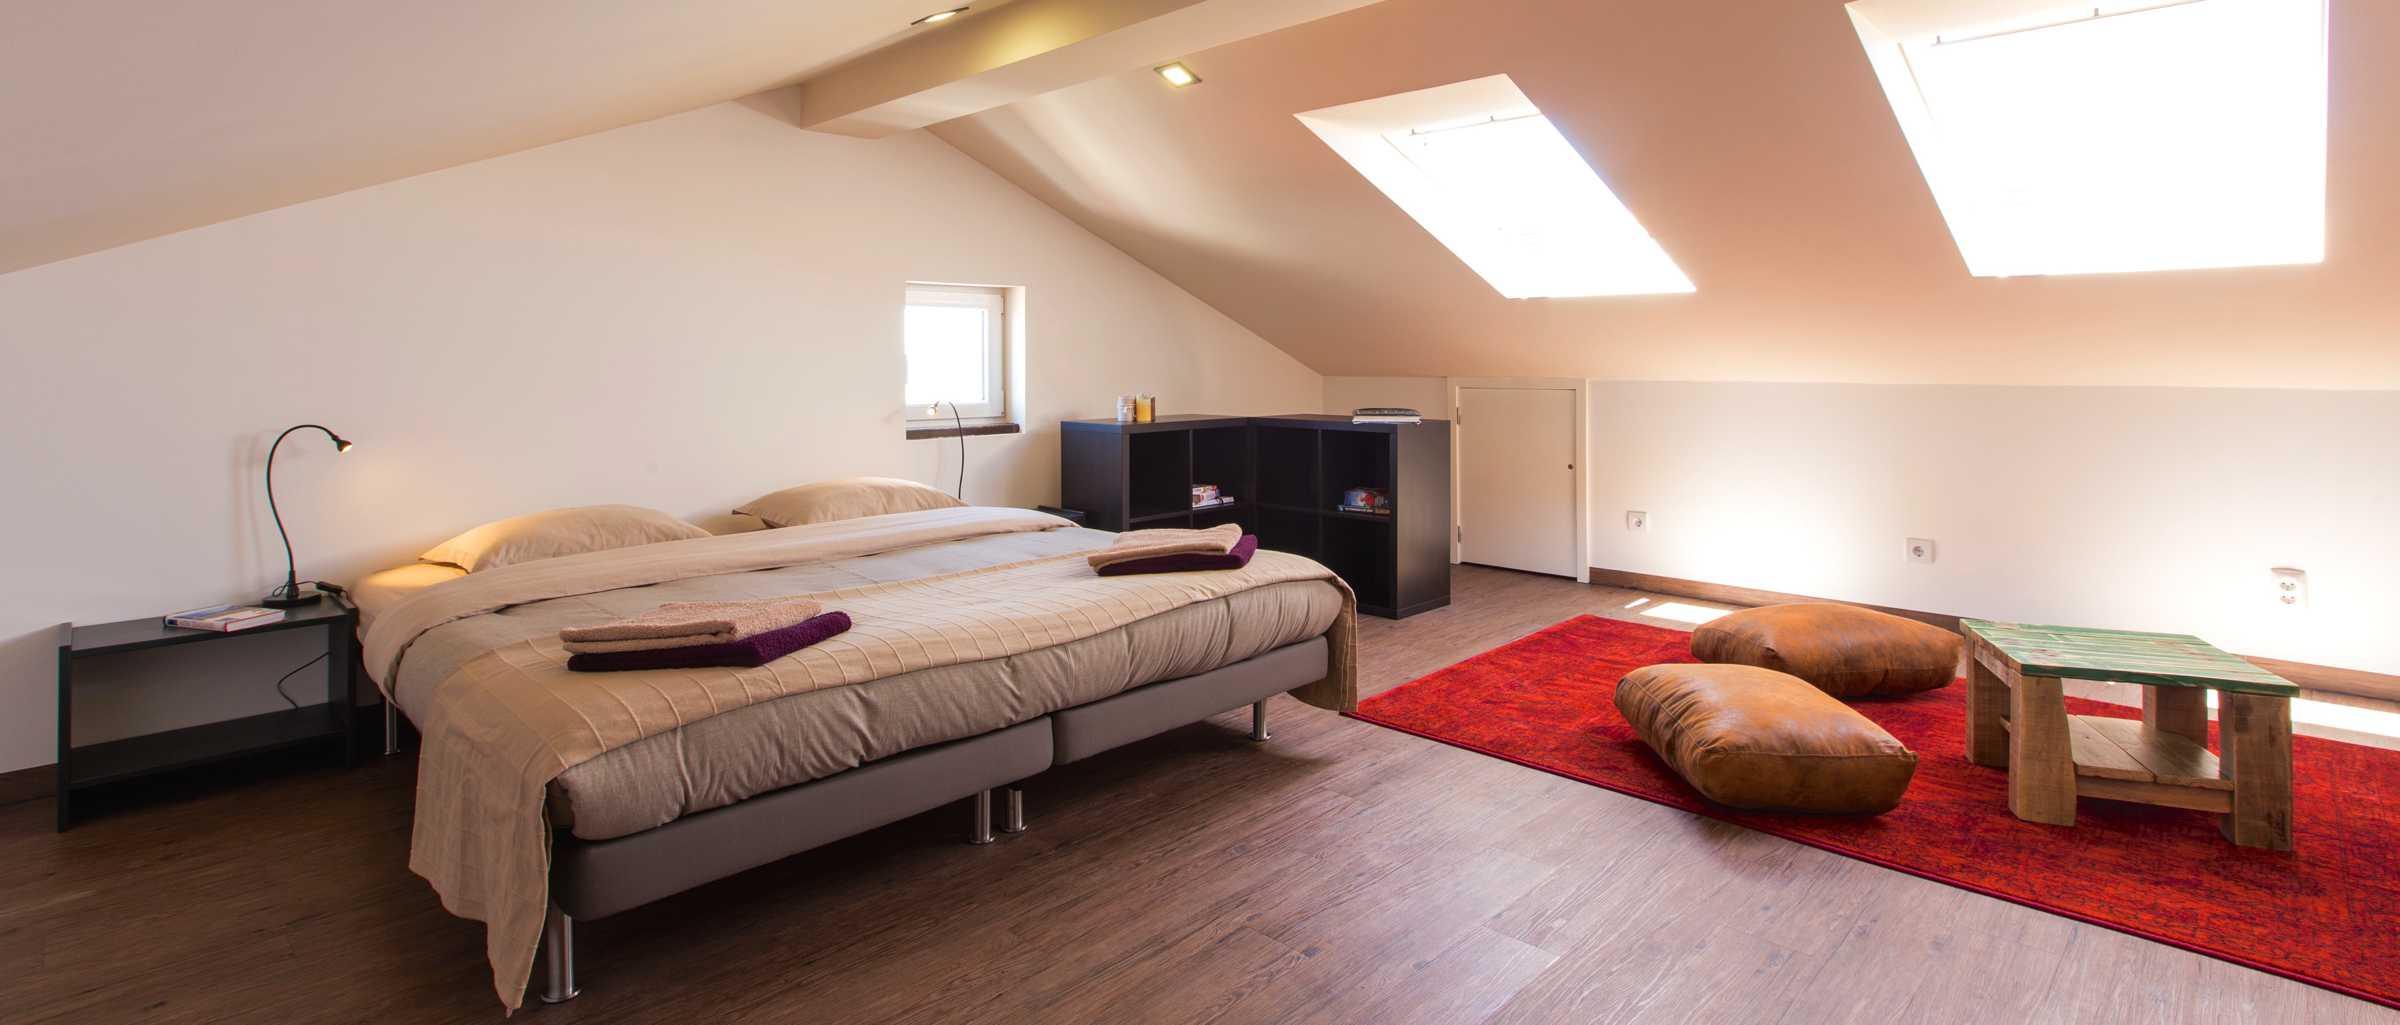 spacious-attic-room.jpg